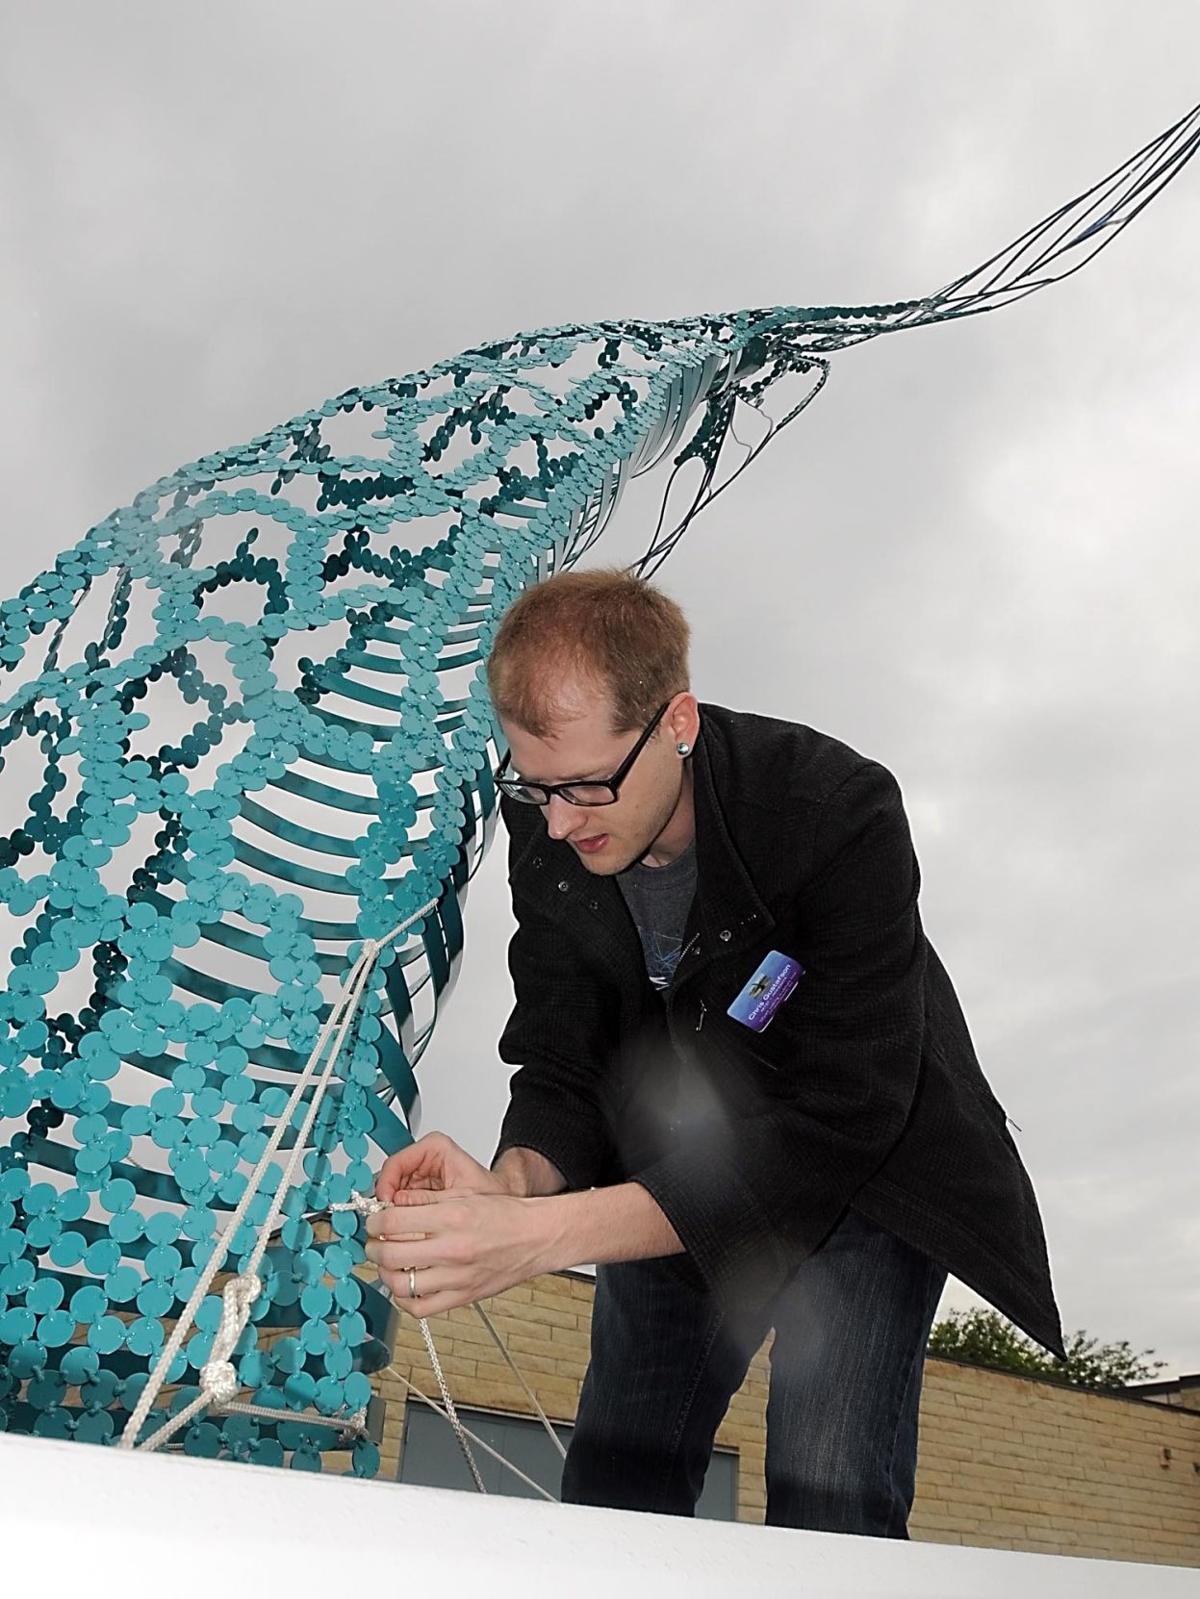 CityArt sculpture installation